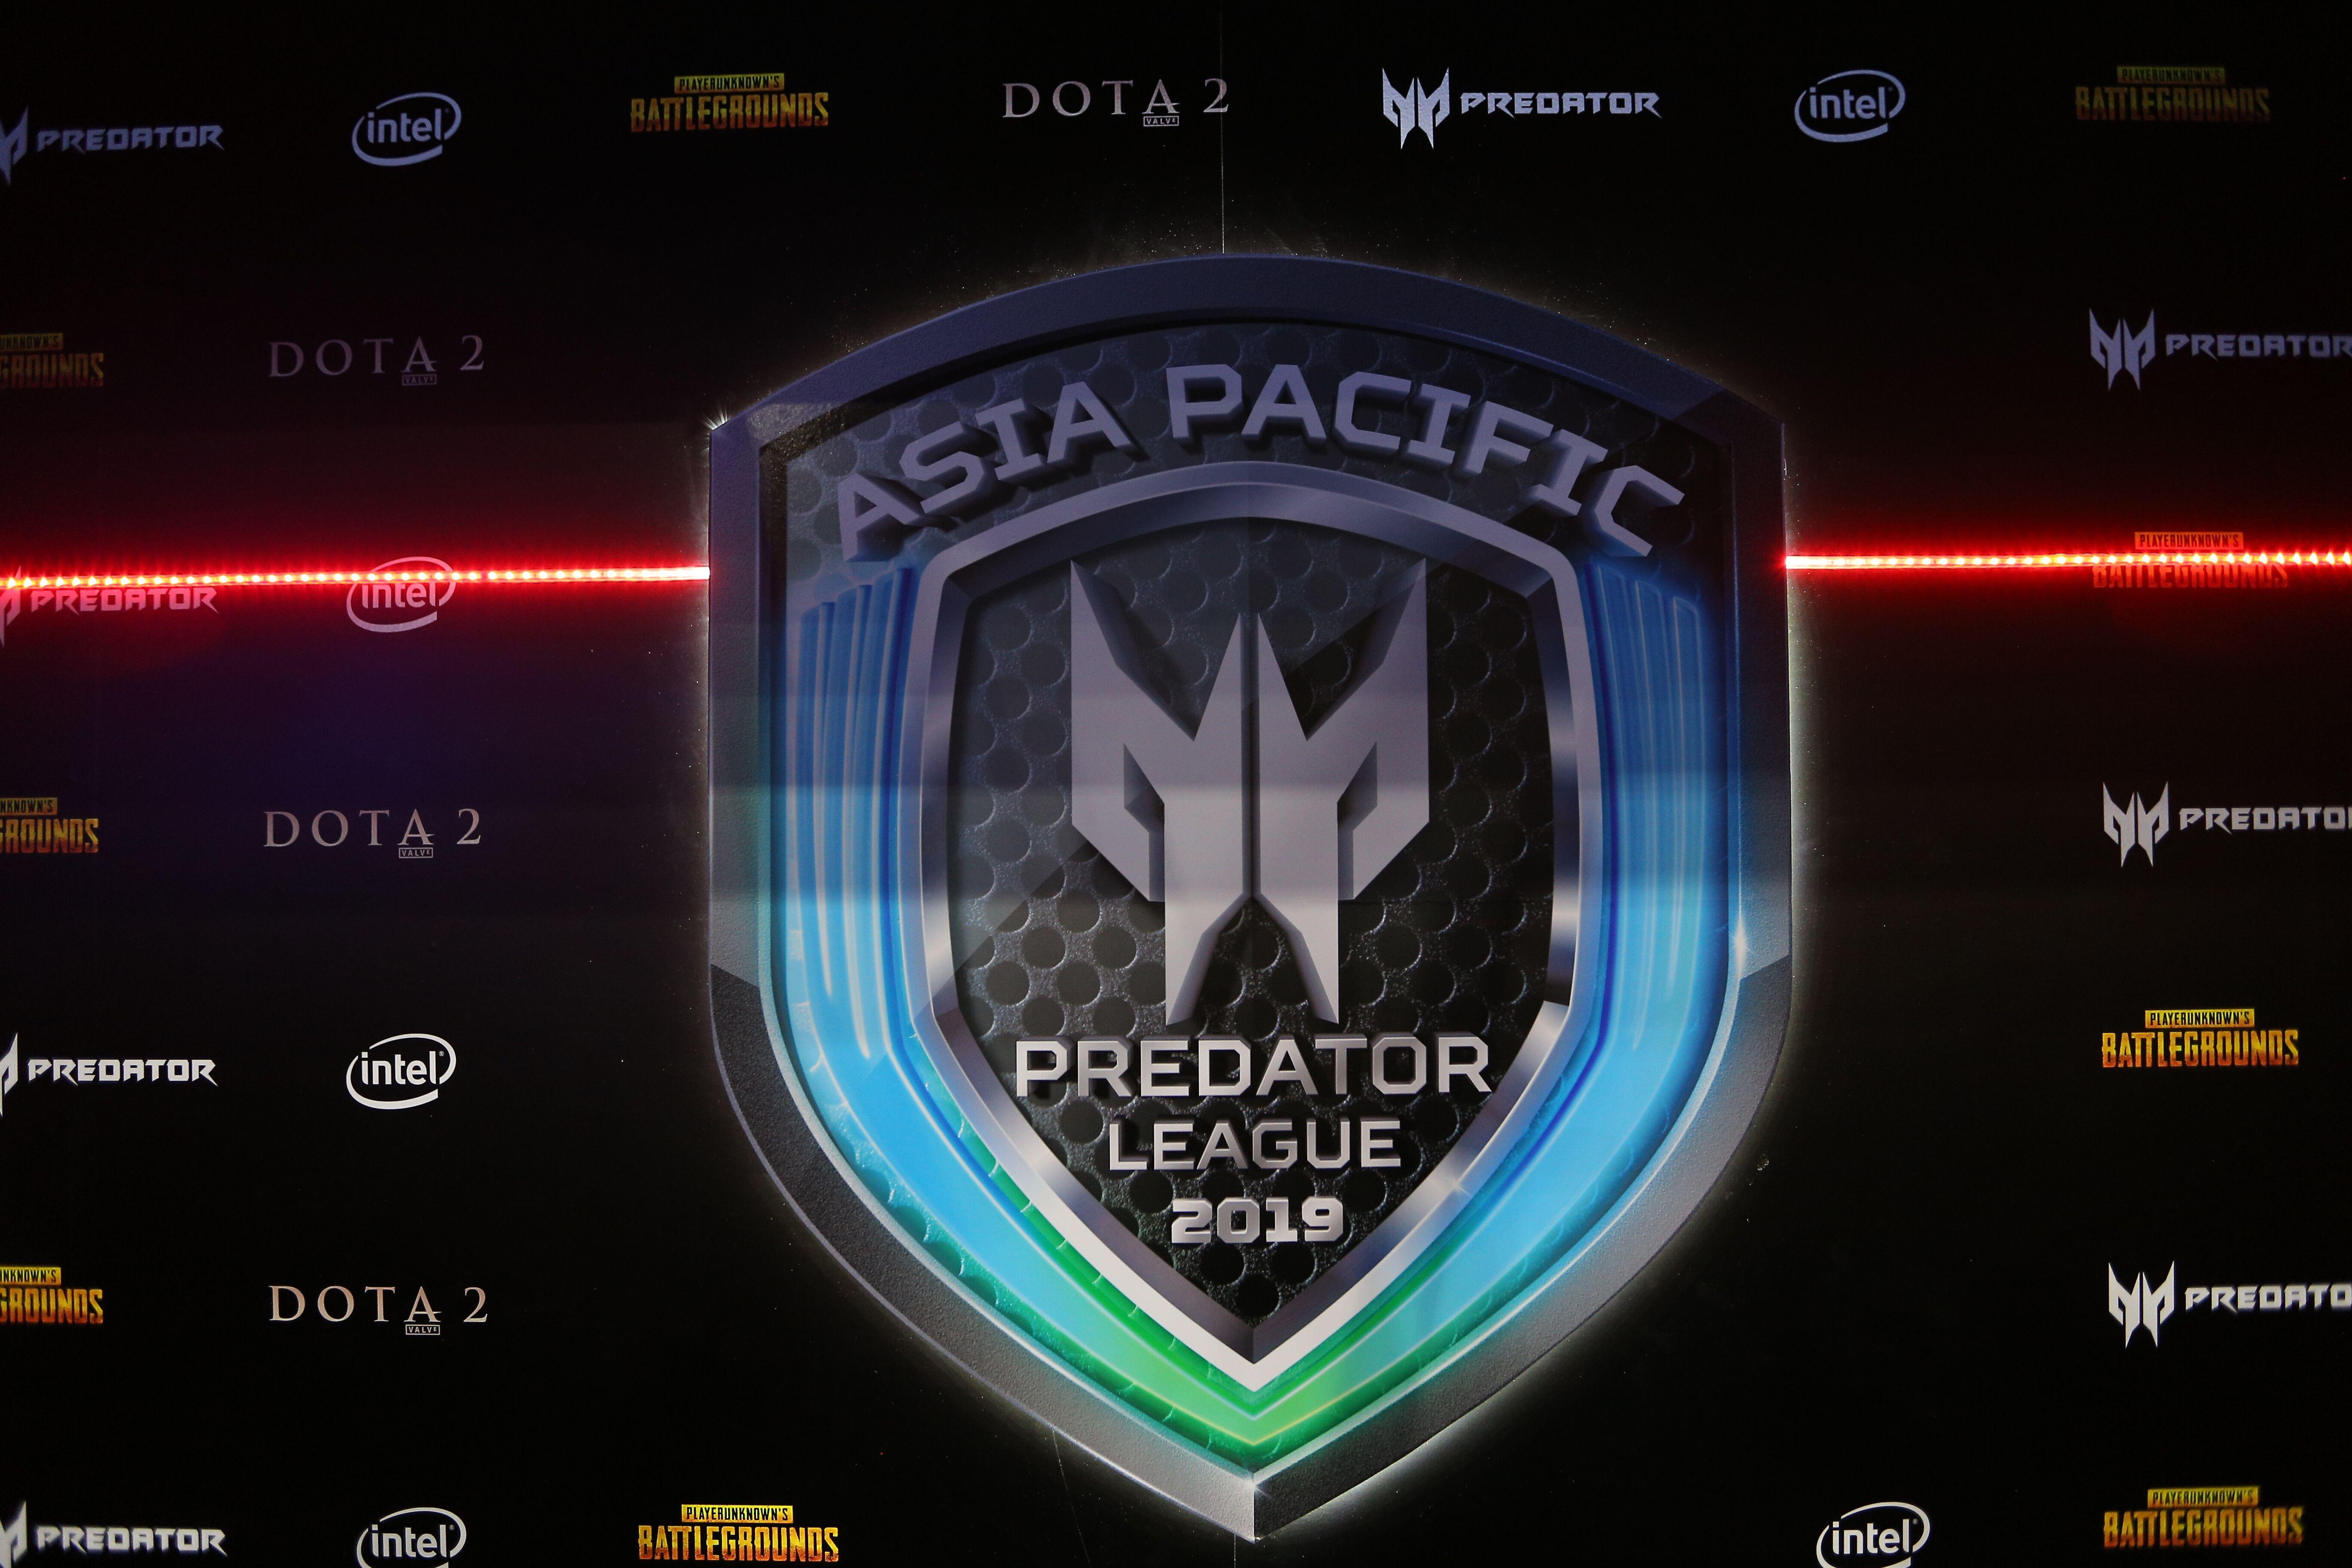 3zjvhpvs jpeg บรรยากาศงาน Asia Pacific Predator League 2019 สุดยอดขุนพลทีมอีสปอร์ตเข้าร่วมการแข่งขันรอบแกรนด์ไฟนอล